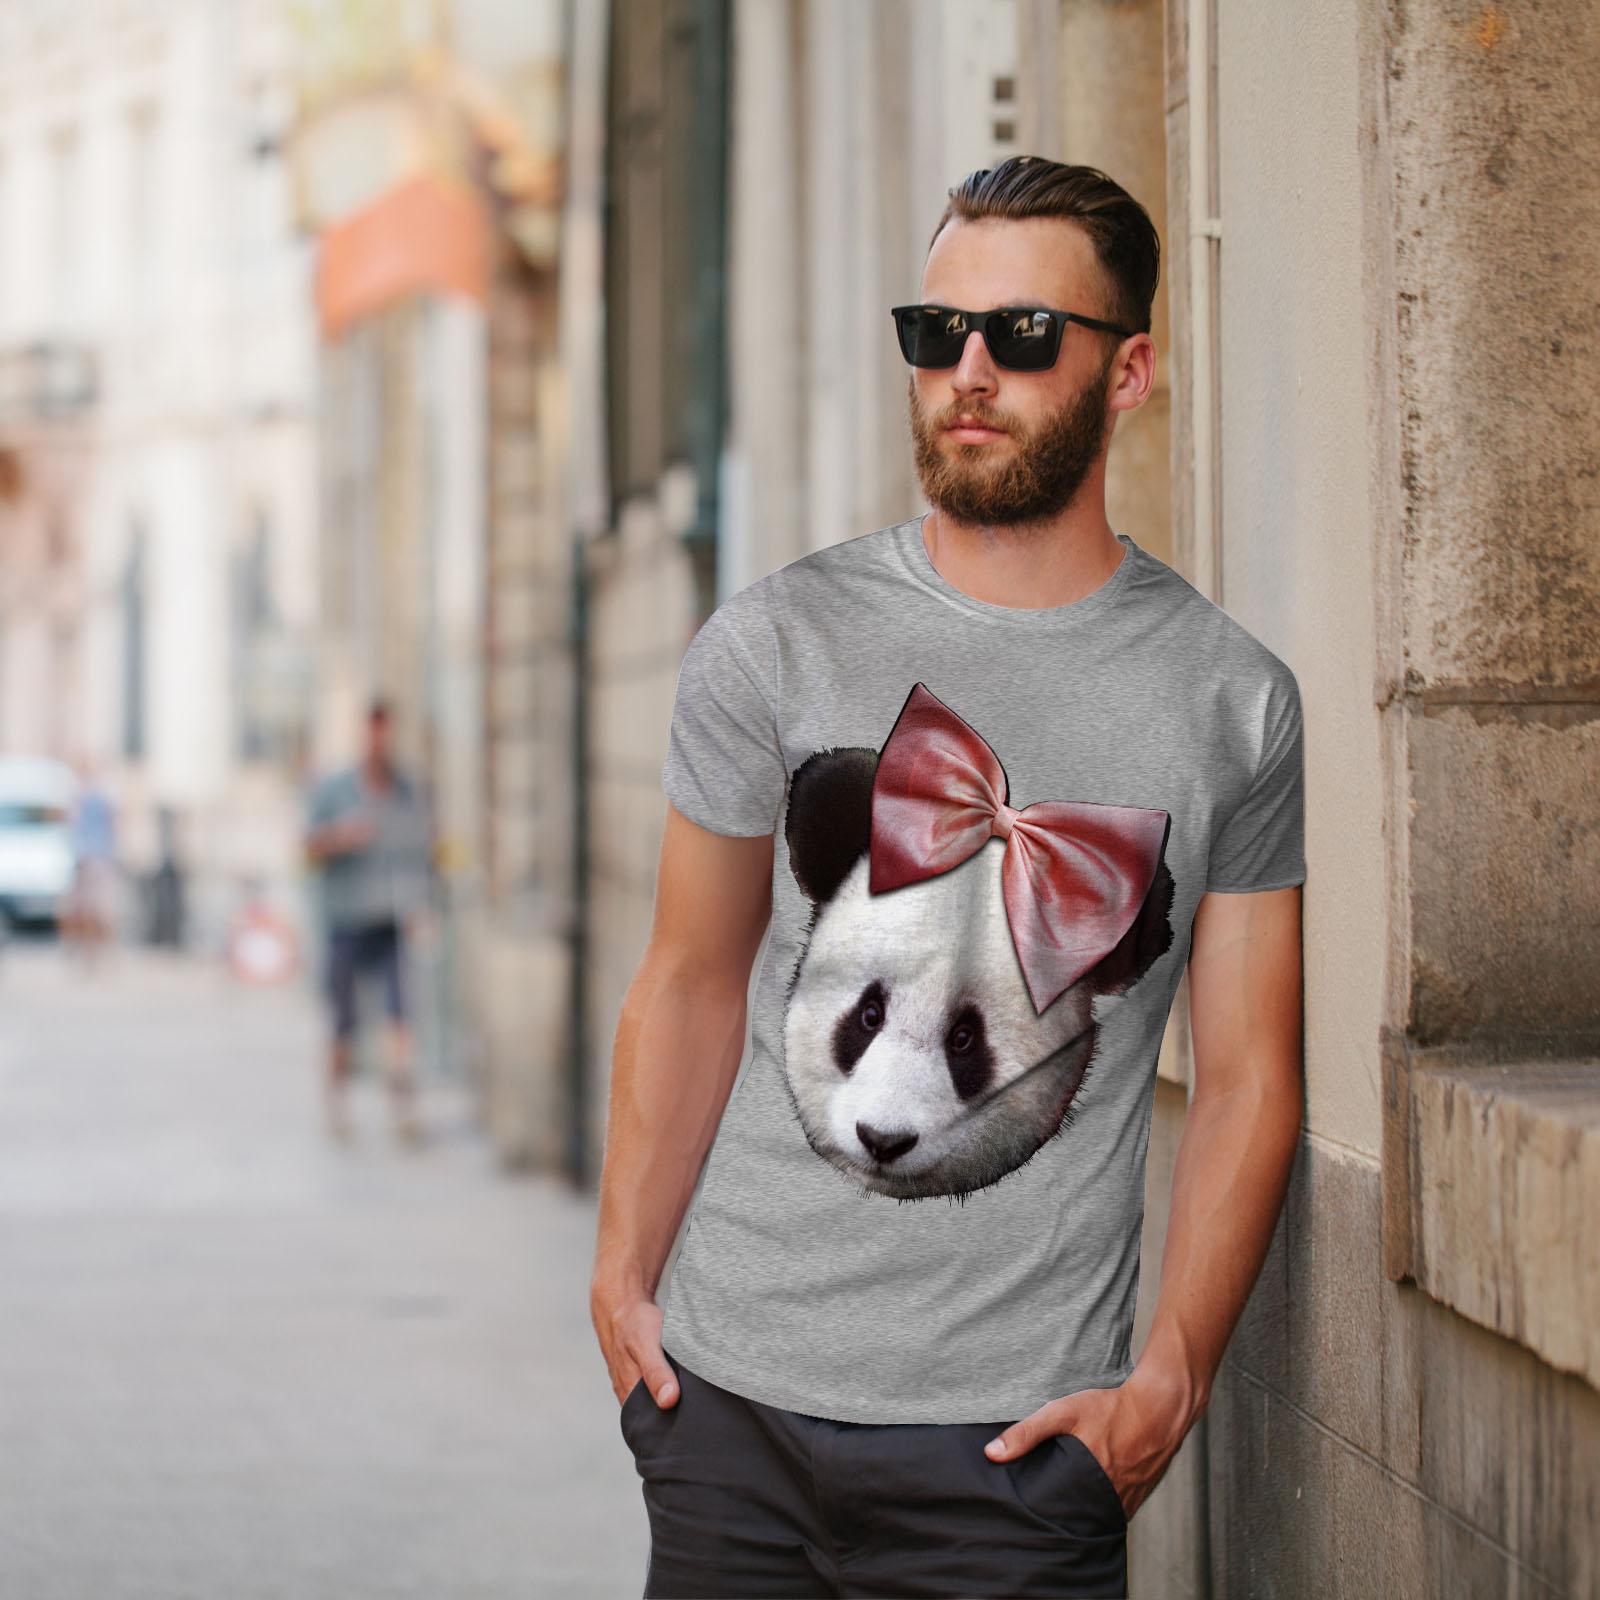 Wellcoda Panda Carino Nastro Da Uomo T-shirt tenerezza design grafico stampato T-shirt